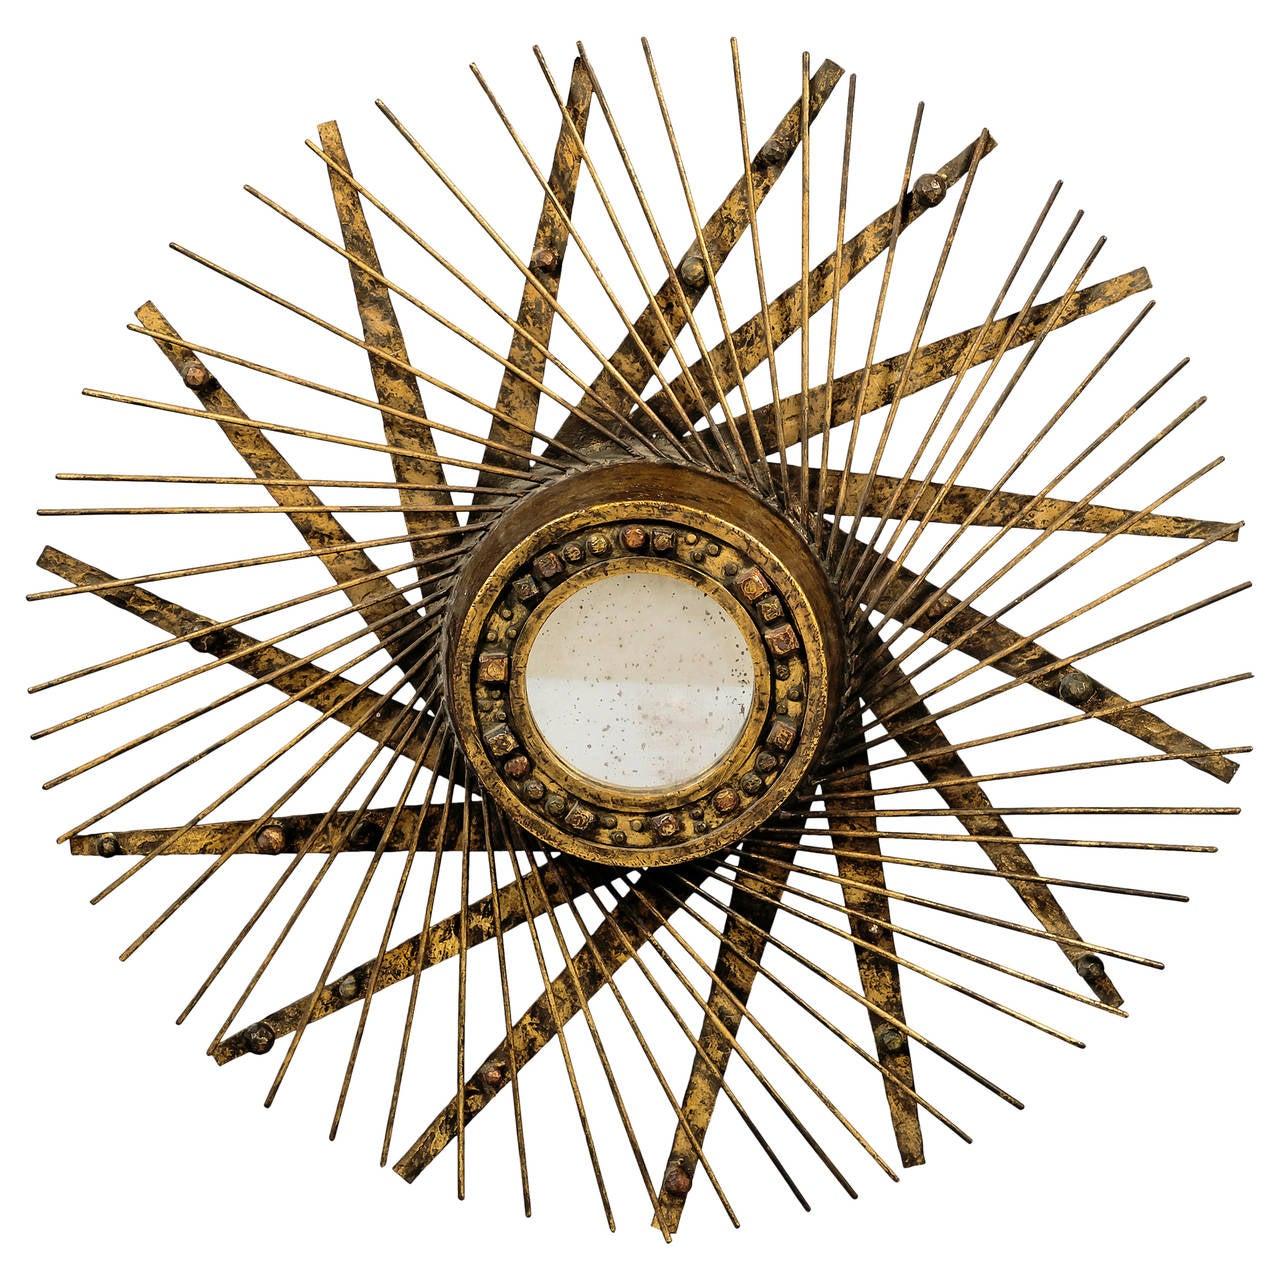 Aluminum Brass Working France: 1950s Brutalist Metal Mirror, France For Sale At 1stdibs